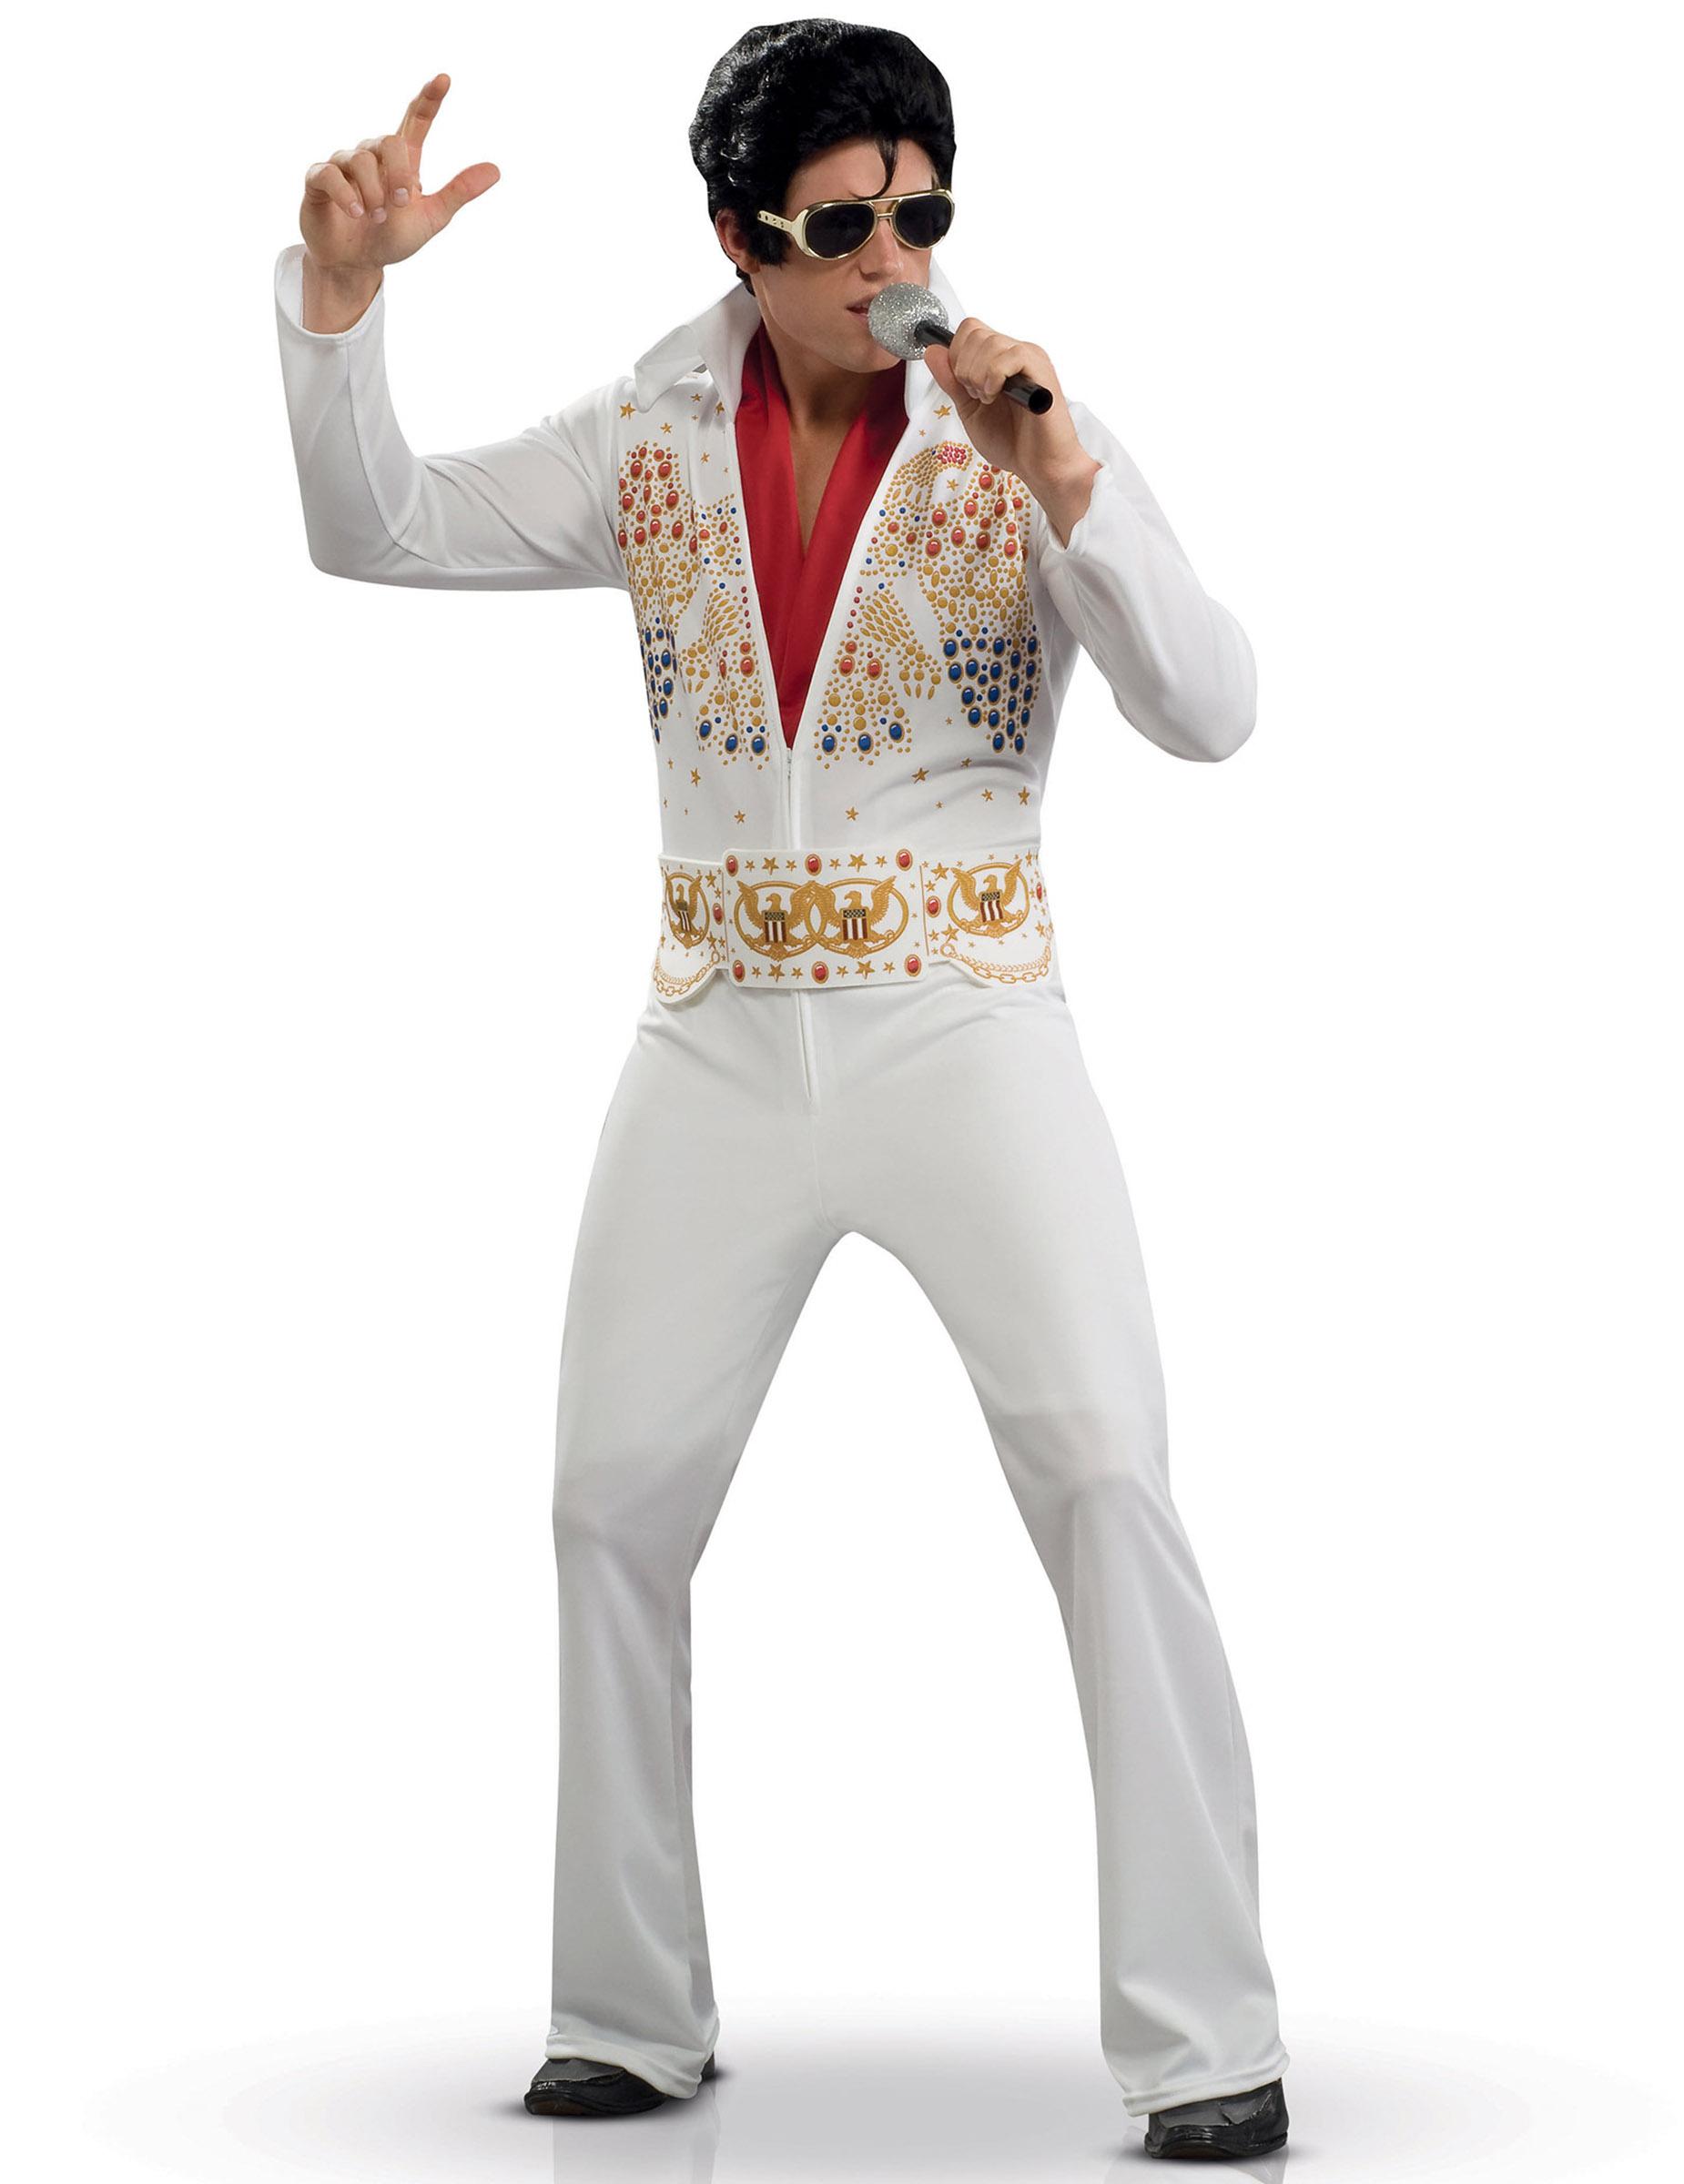 4321c53b6 Disfarce Elvis Presley™ luxo adulto: Disfarces Adultos,mascarilhas e ...